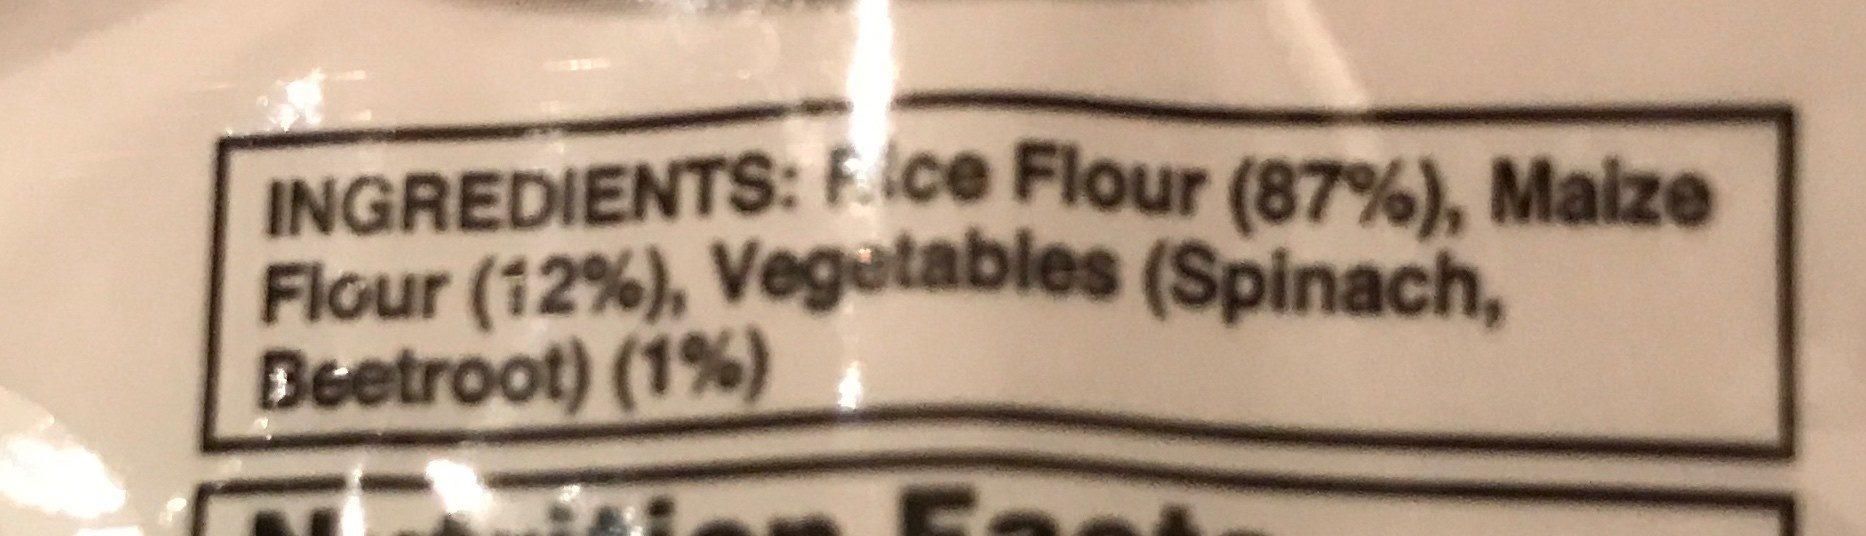 Rice & Corn Vegetable Pasta - Ingredients